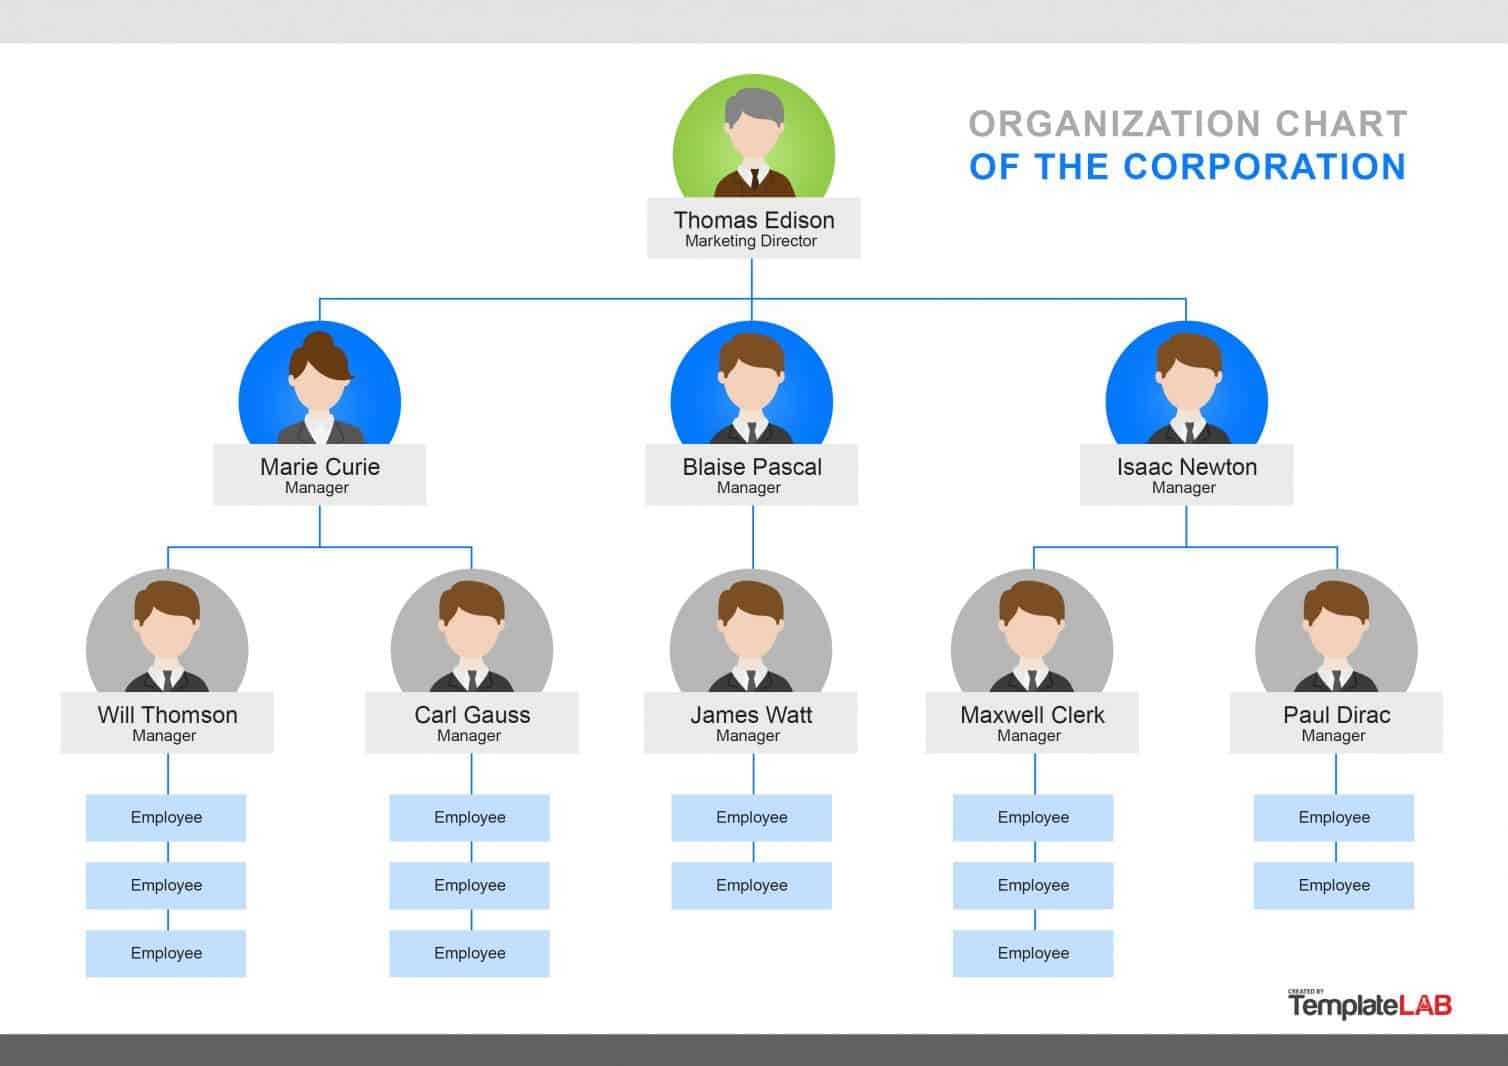 40 Organizational Chart Templates (Word, Excel, Powerpoint) Regarding Org Chart Word Template